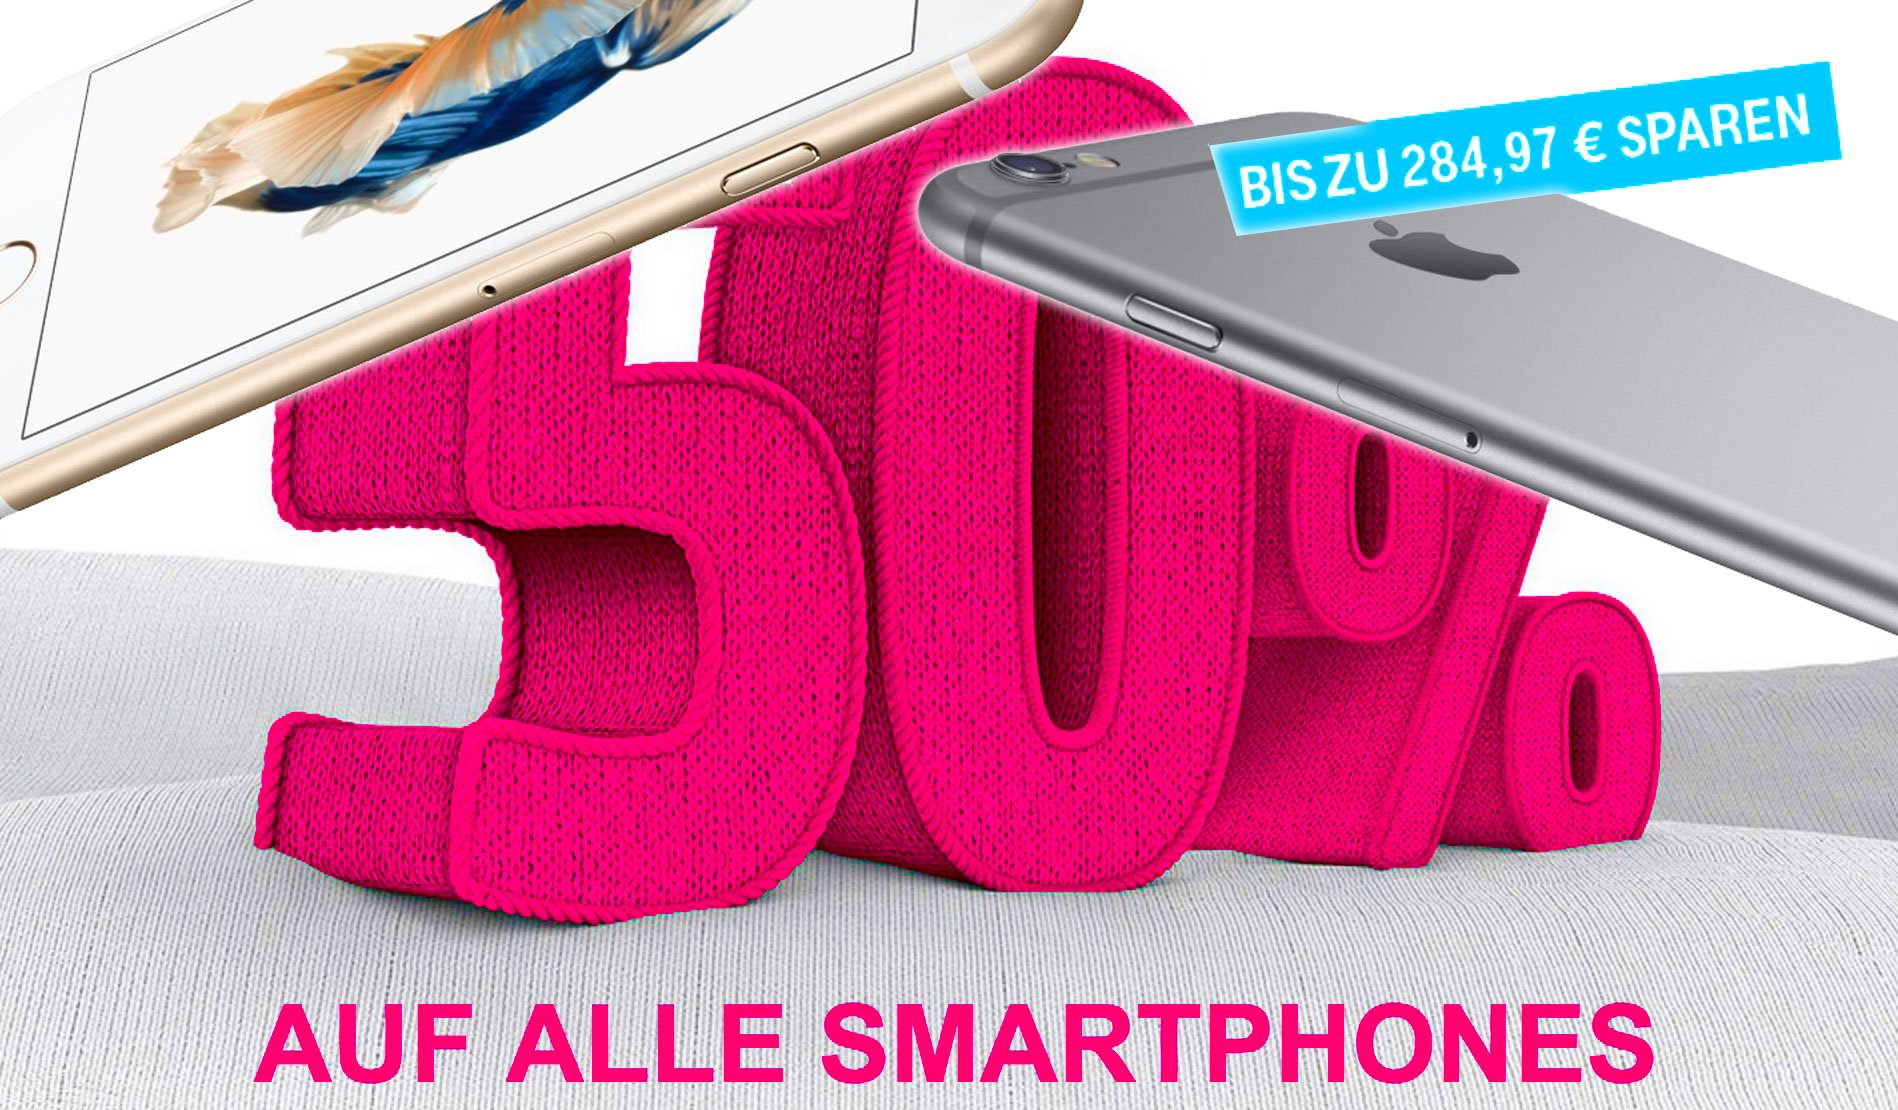 iPhone 6s Telekom Aktion: alle Smartphones (auch iPhone) 50% billiger 1